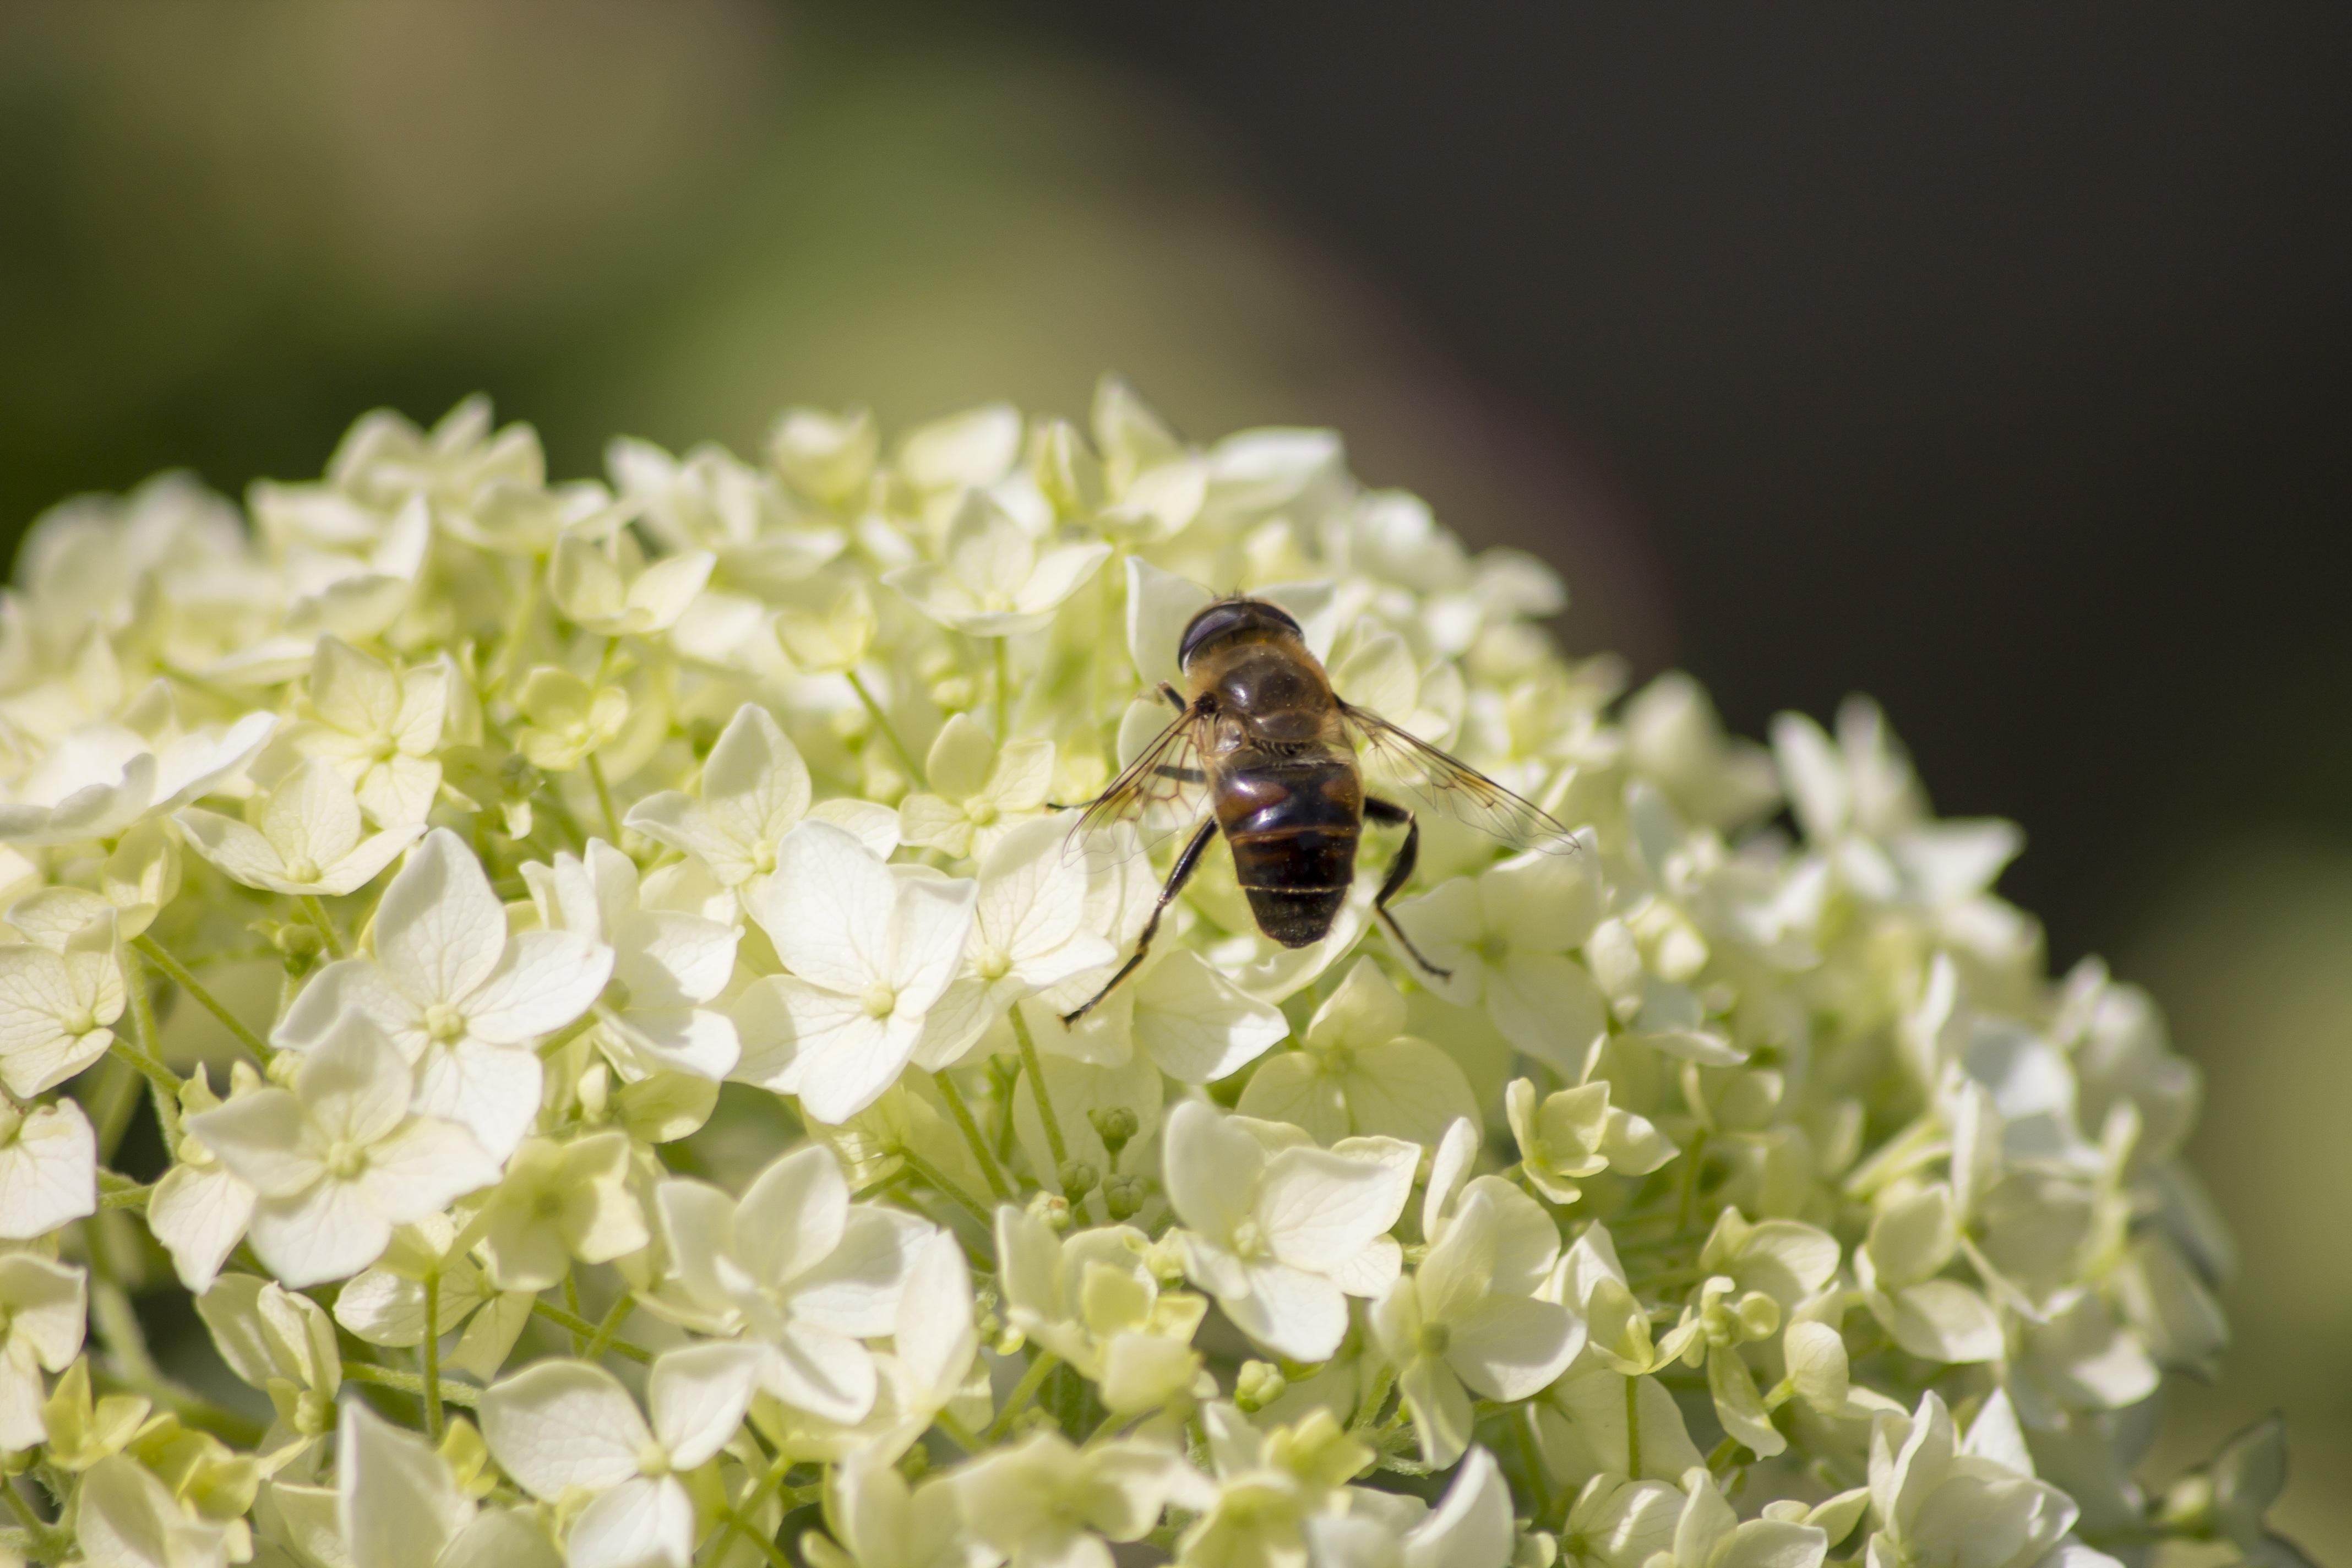 Free Images Nature Branch Blossom Plant White Flower Petal Bloom Fly Pollen Spring Green Spray Bug Botany Garden Flora Hydrangea Fauna